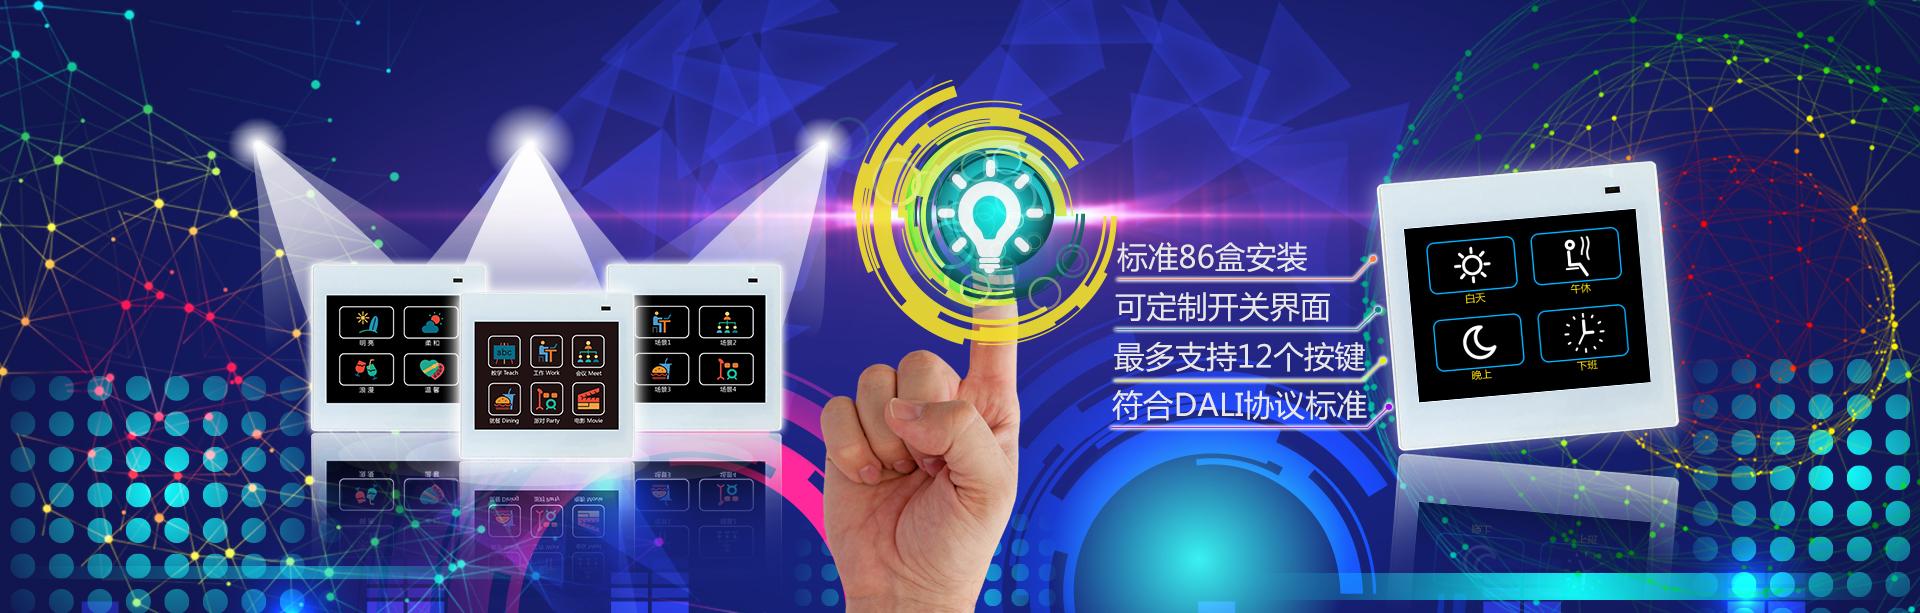 LED可编辑控制面板